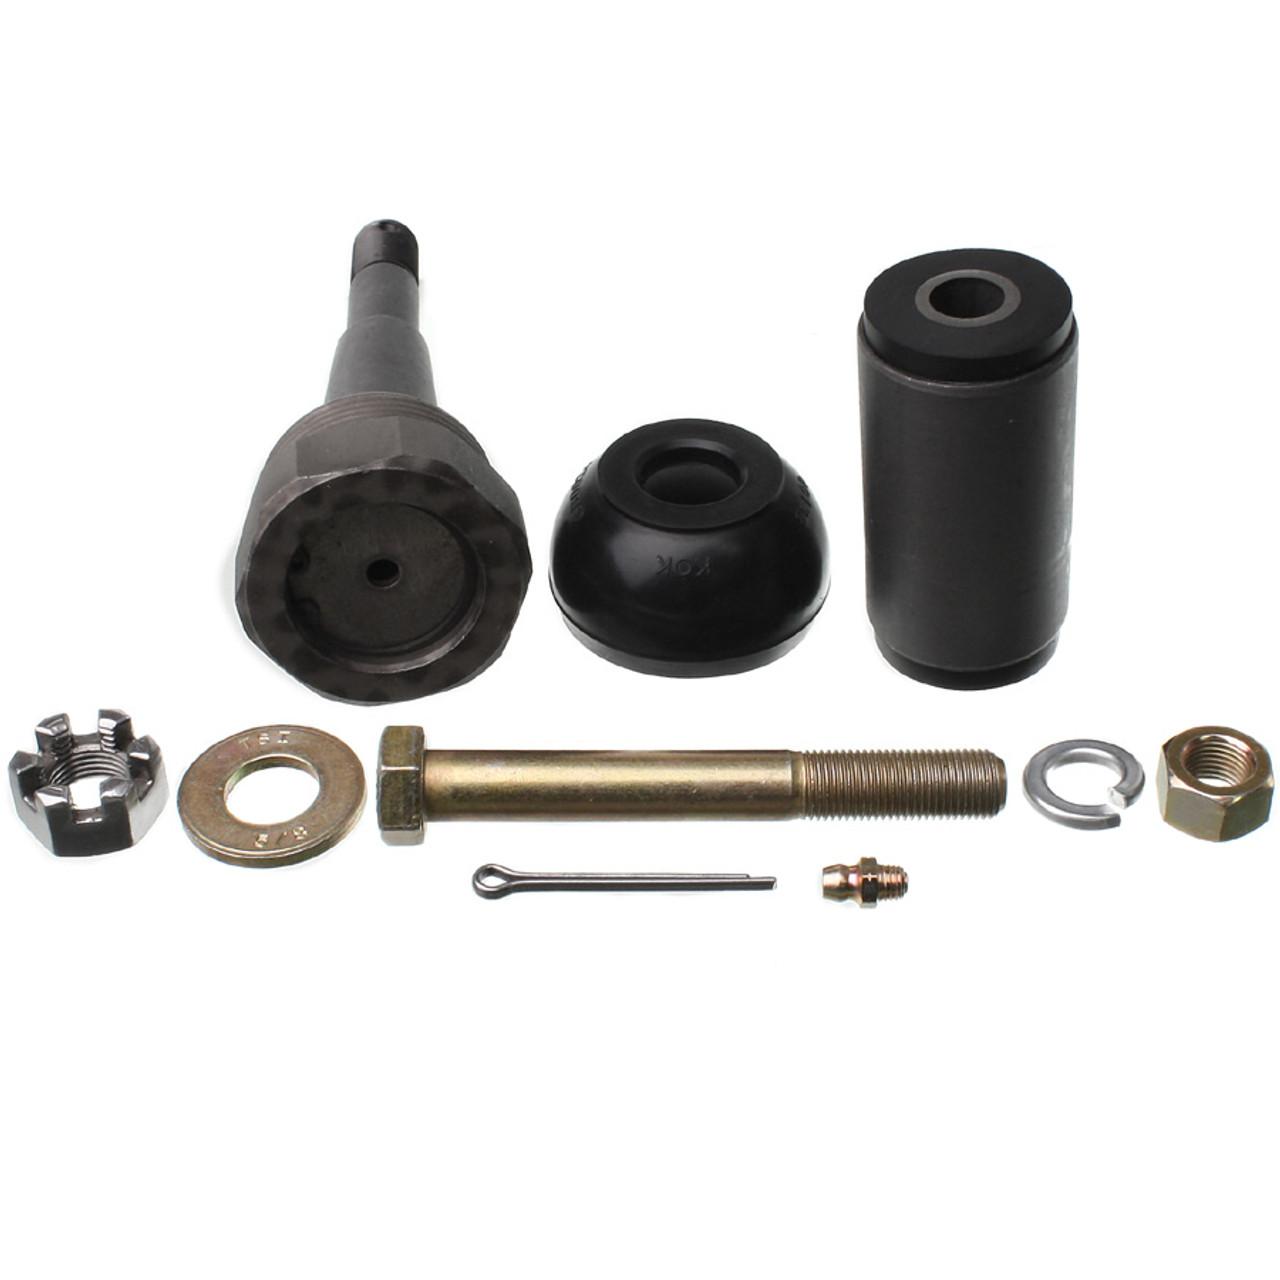 Rare Parts Rear Lower Control Arm Bushing and Joint Kit 1957-1958 Cadillac  Eldorado Brougham w/Air Suspension 19697